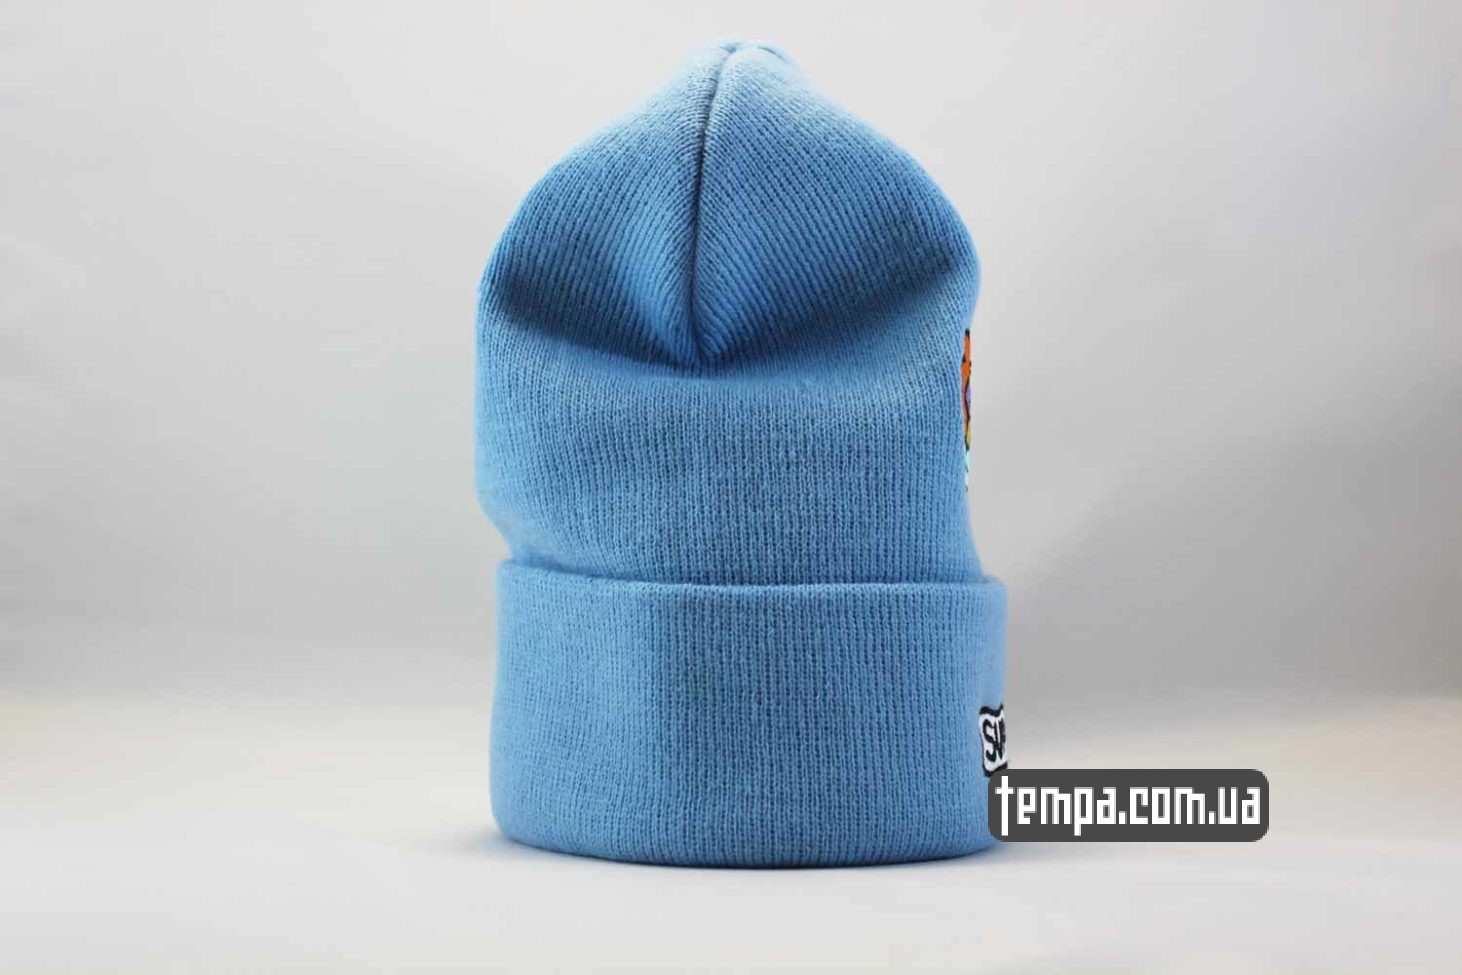 суприм Киев Одесса шапка beanie supreme blue голубая supream магазин